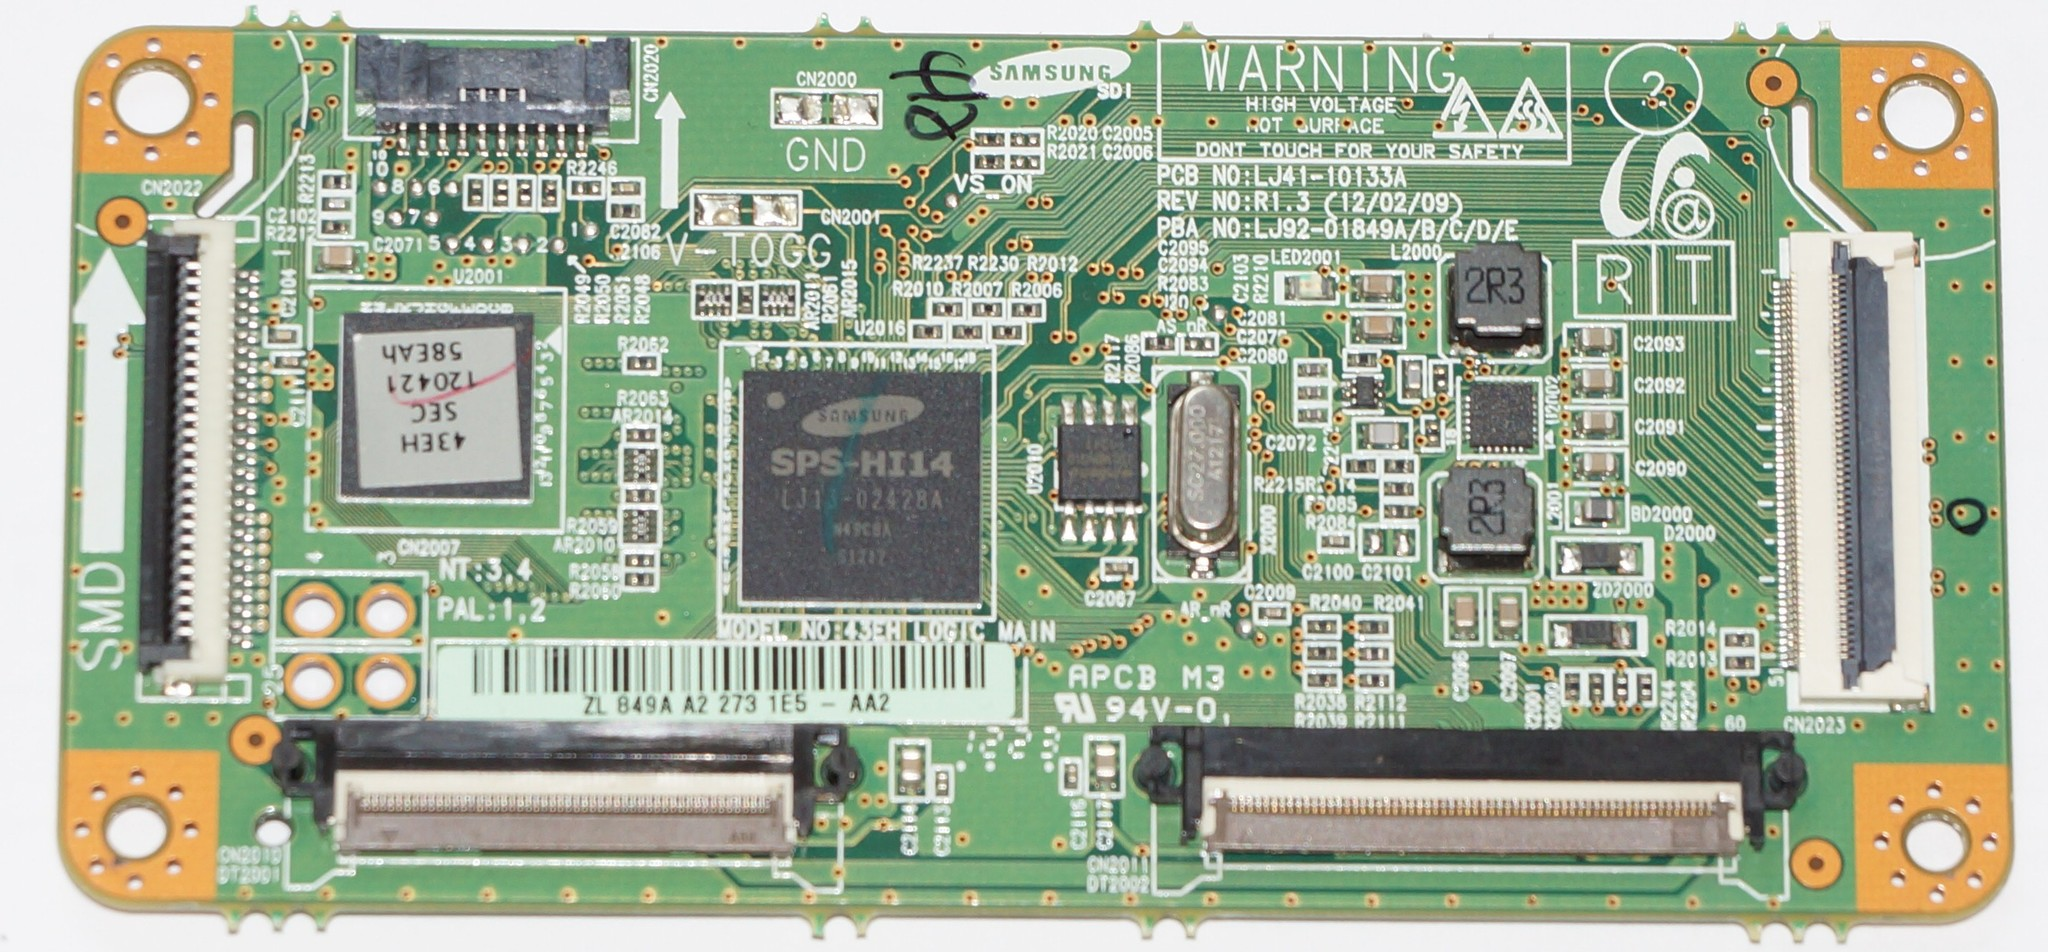 LJ41-10133A LJ92-018494 model 43eh logic main телевизора Samsung